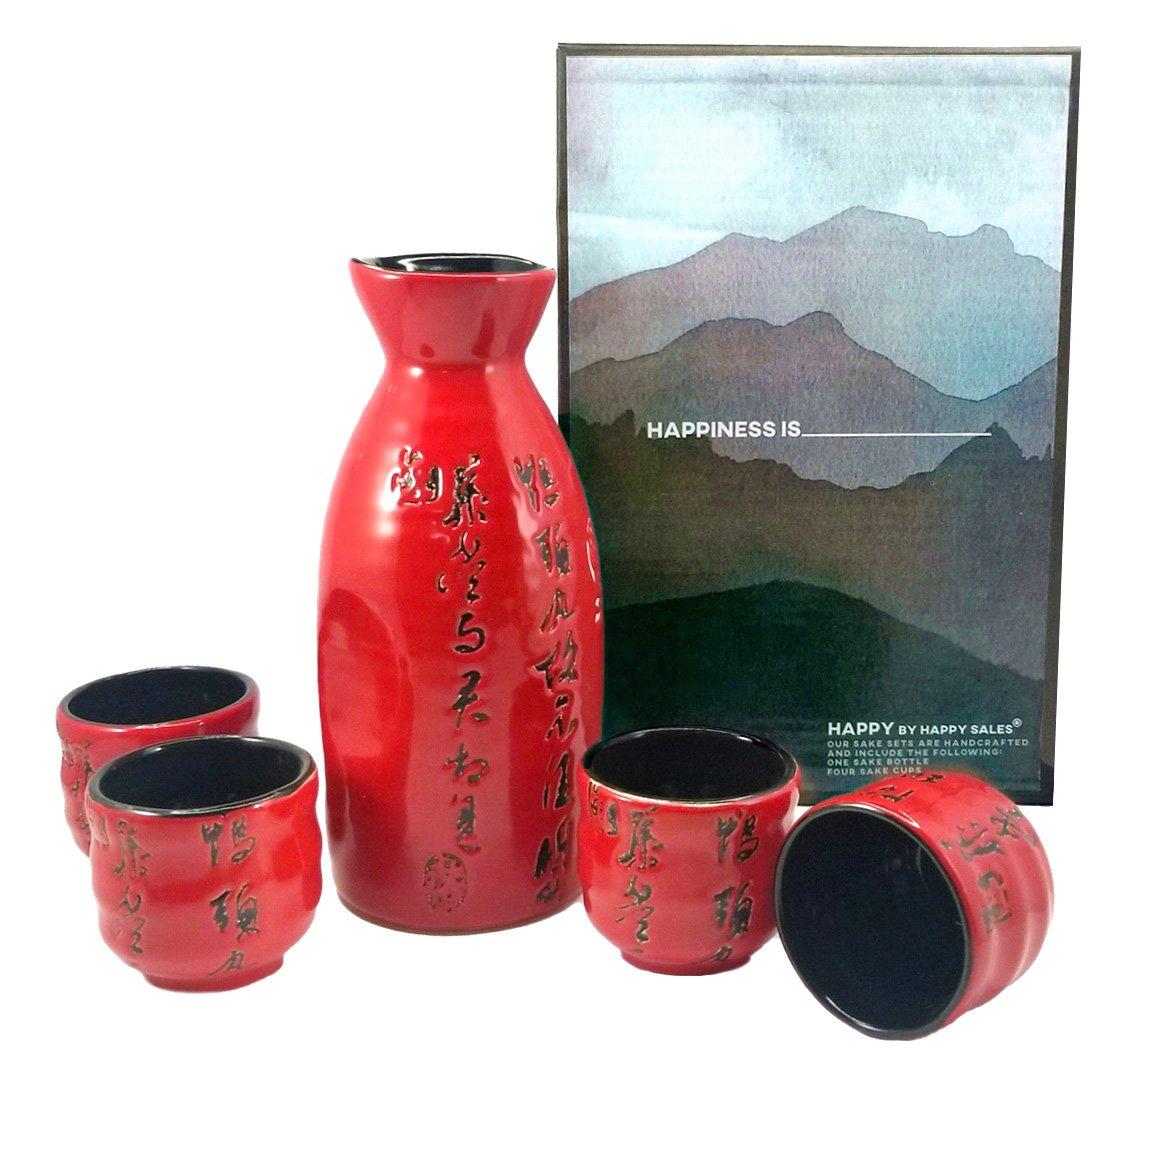 Happy Sales HSSS-PMR06, Japanese Sake Set Calligraphy Red & Black by Happy Sales